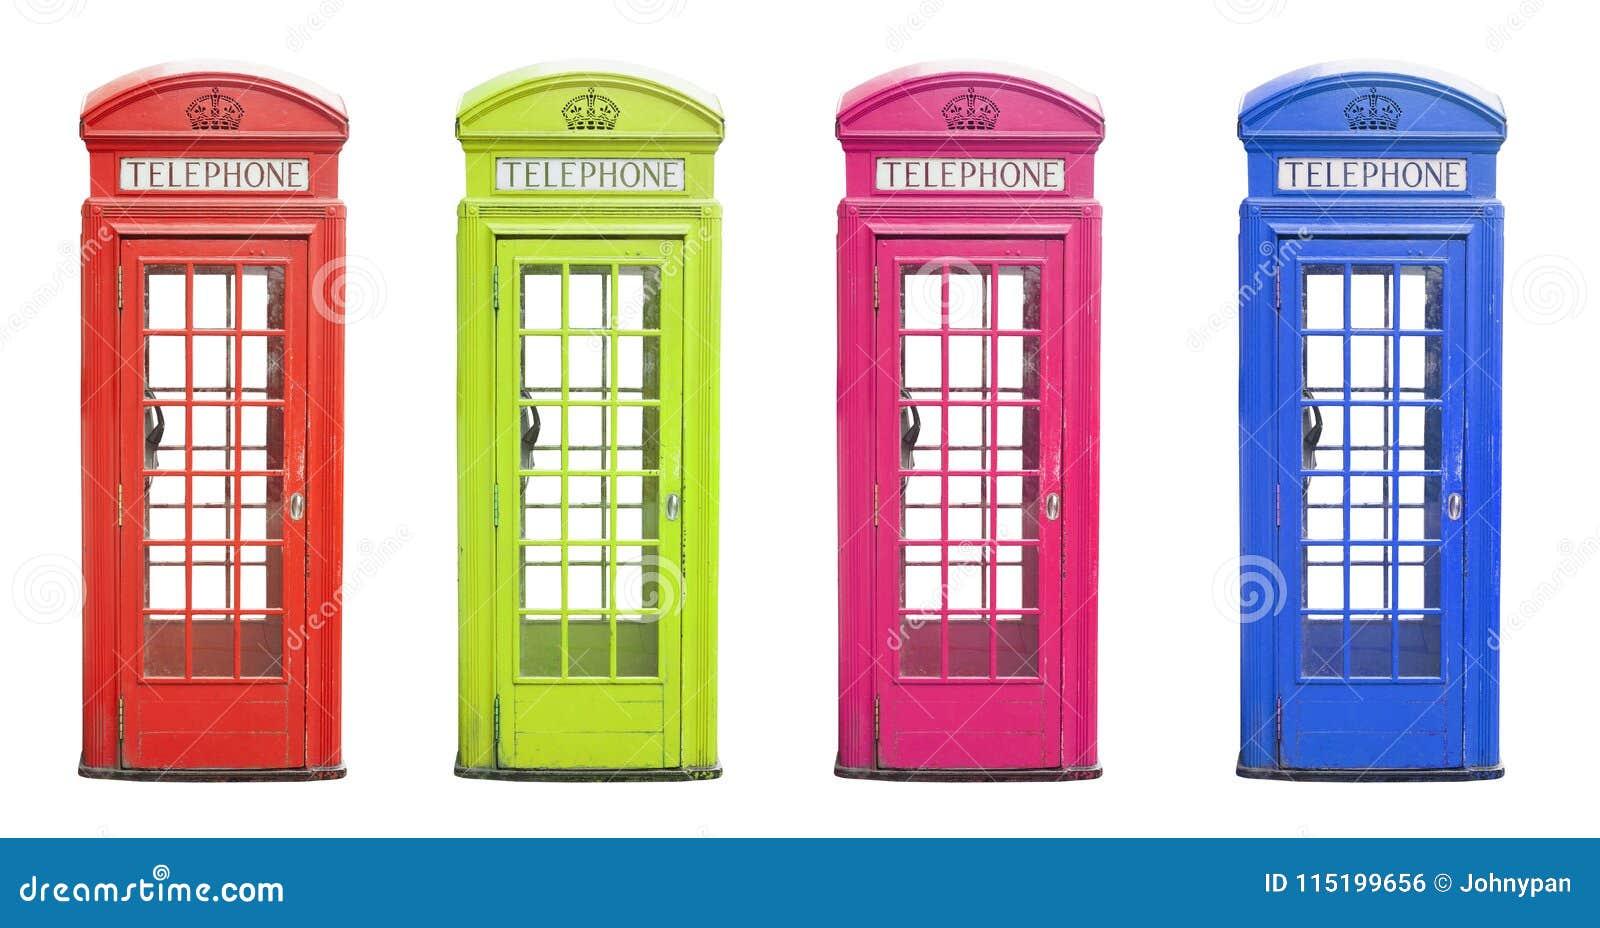 Traditionelle London-Telefonkabine in vielen Farben